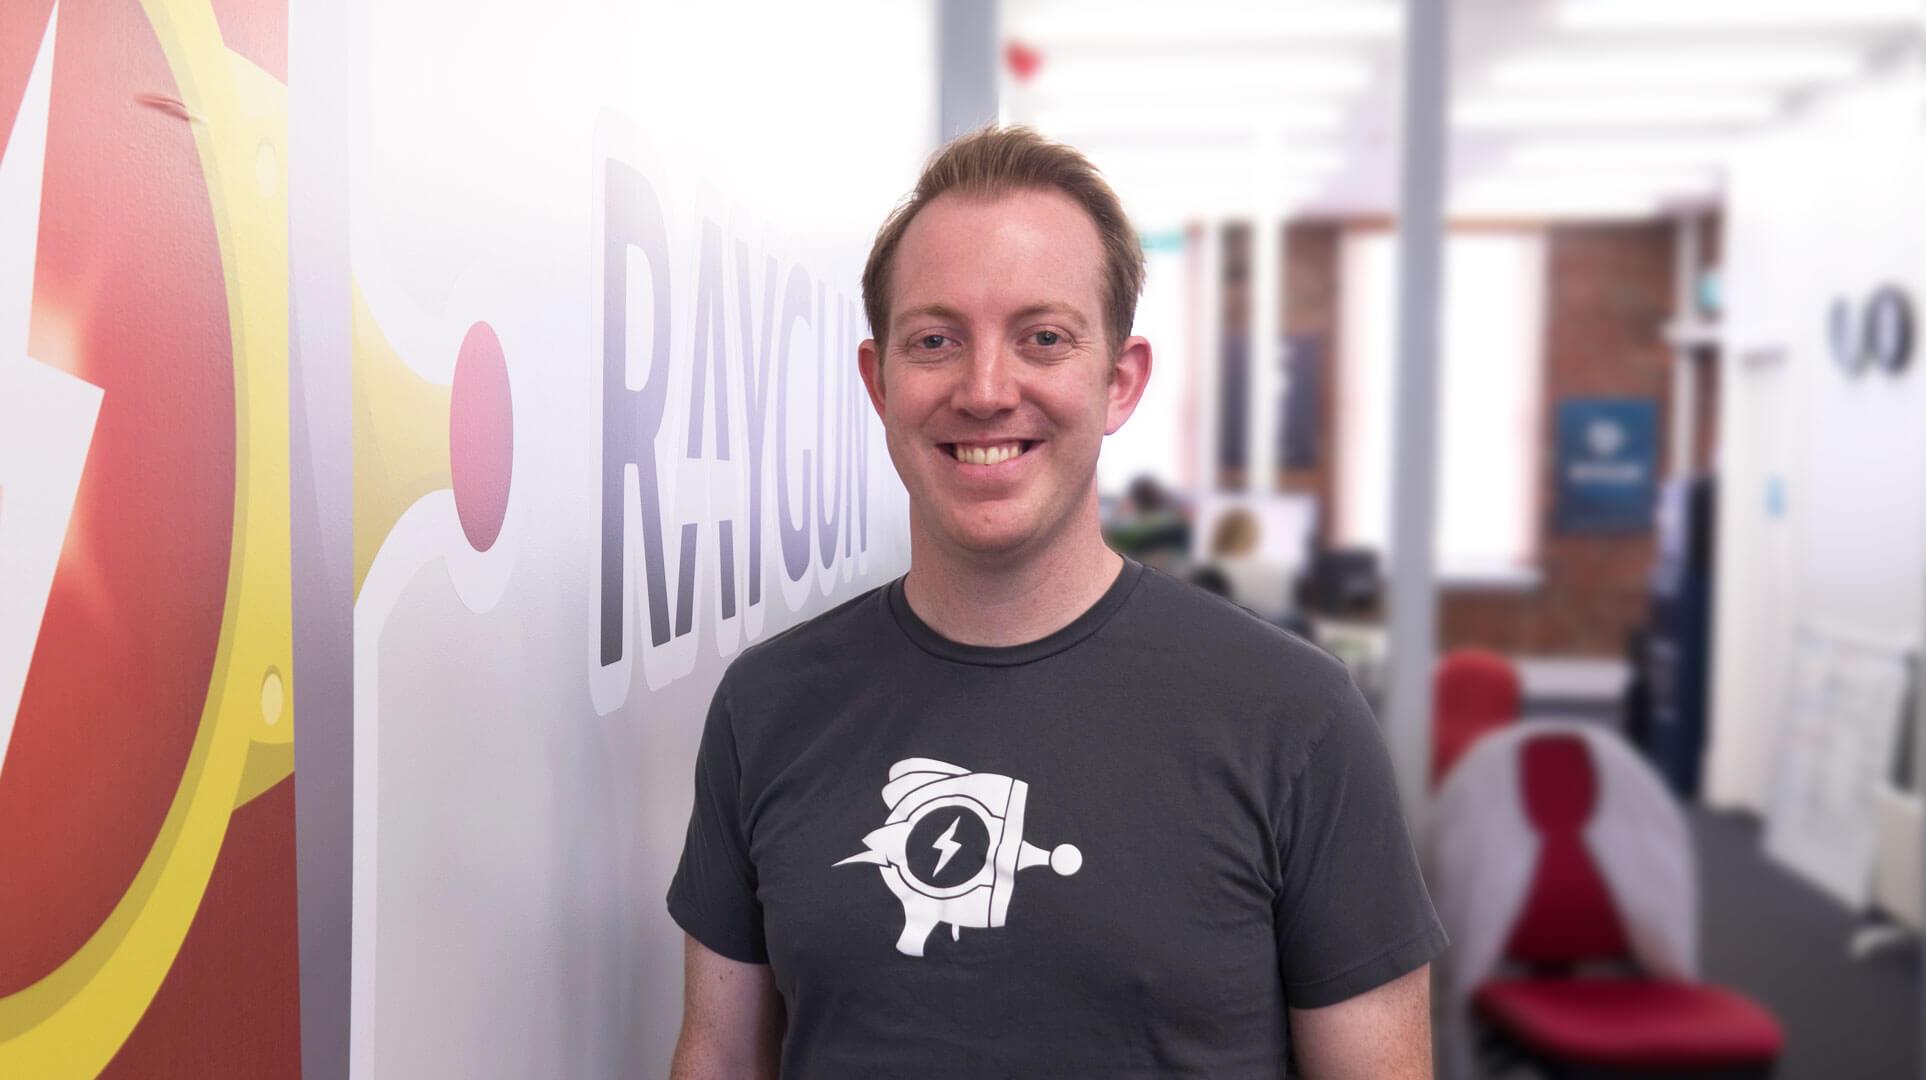 John-Daniel Trask, CEO of Raygun